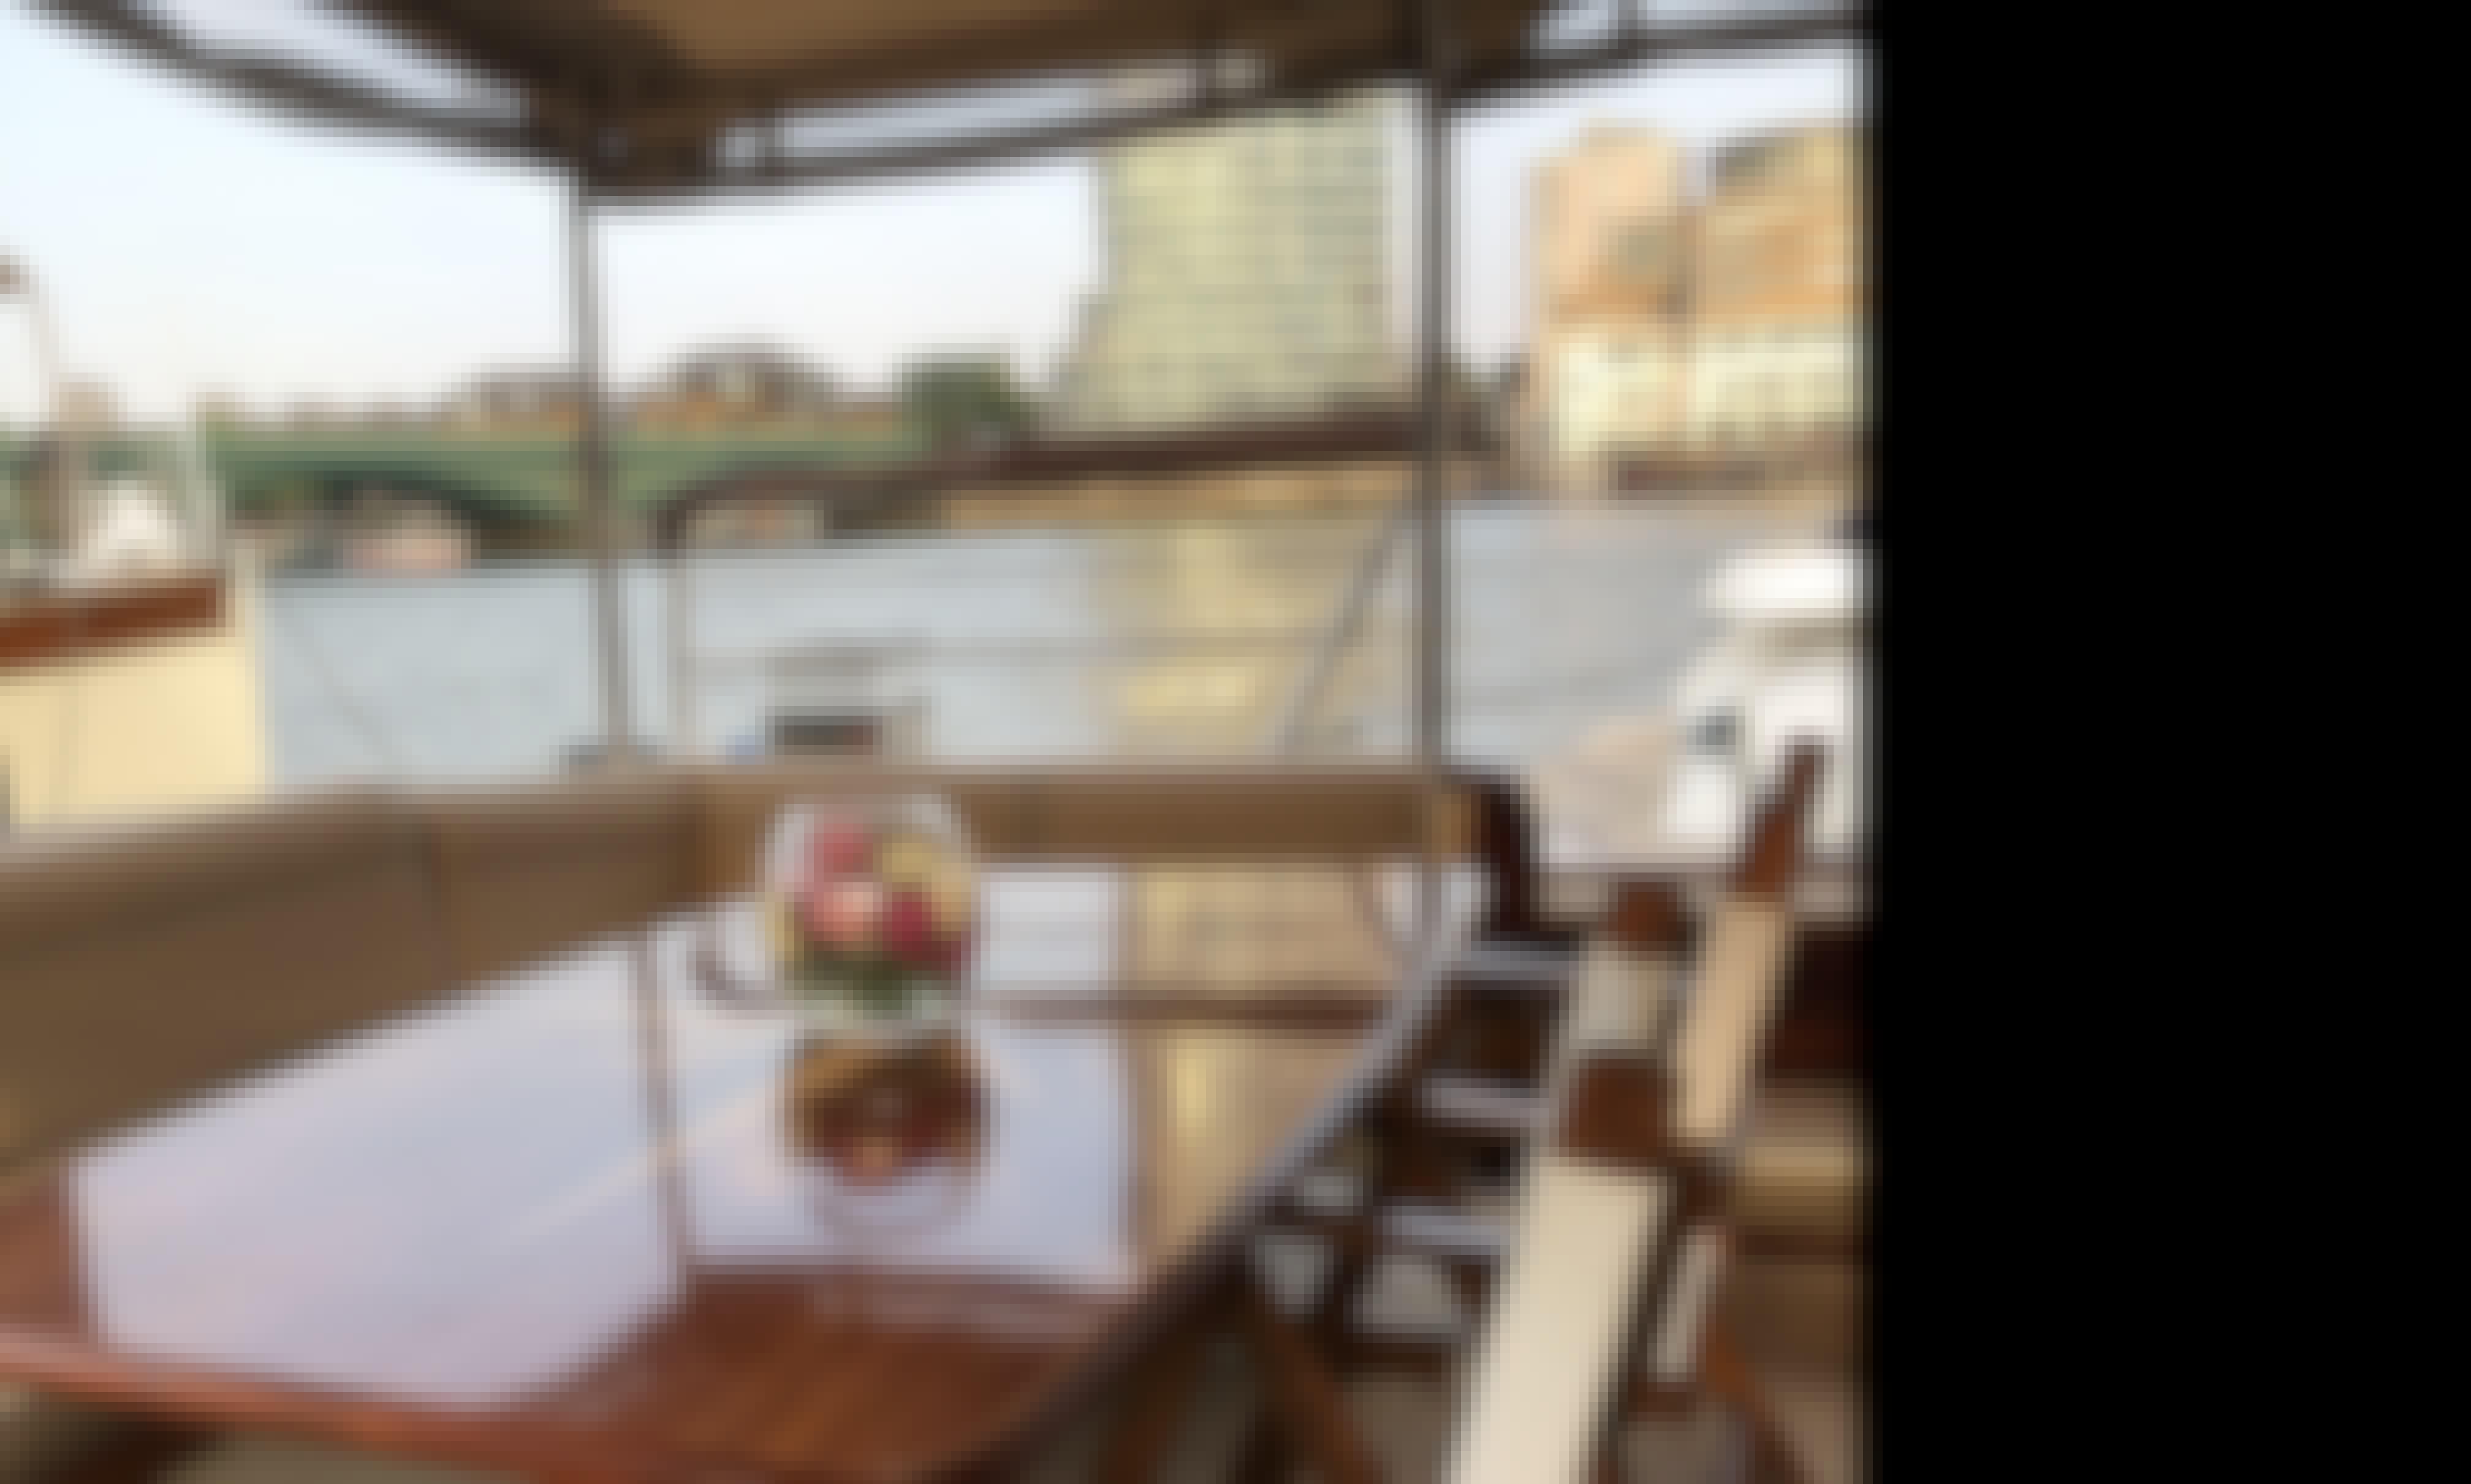 Bourne - a luxury charter yacht in Chelsea, London